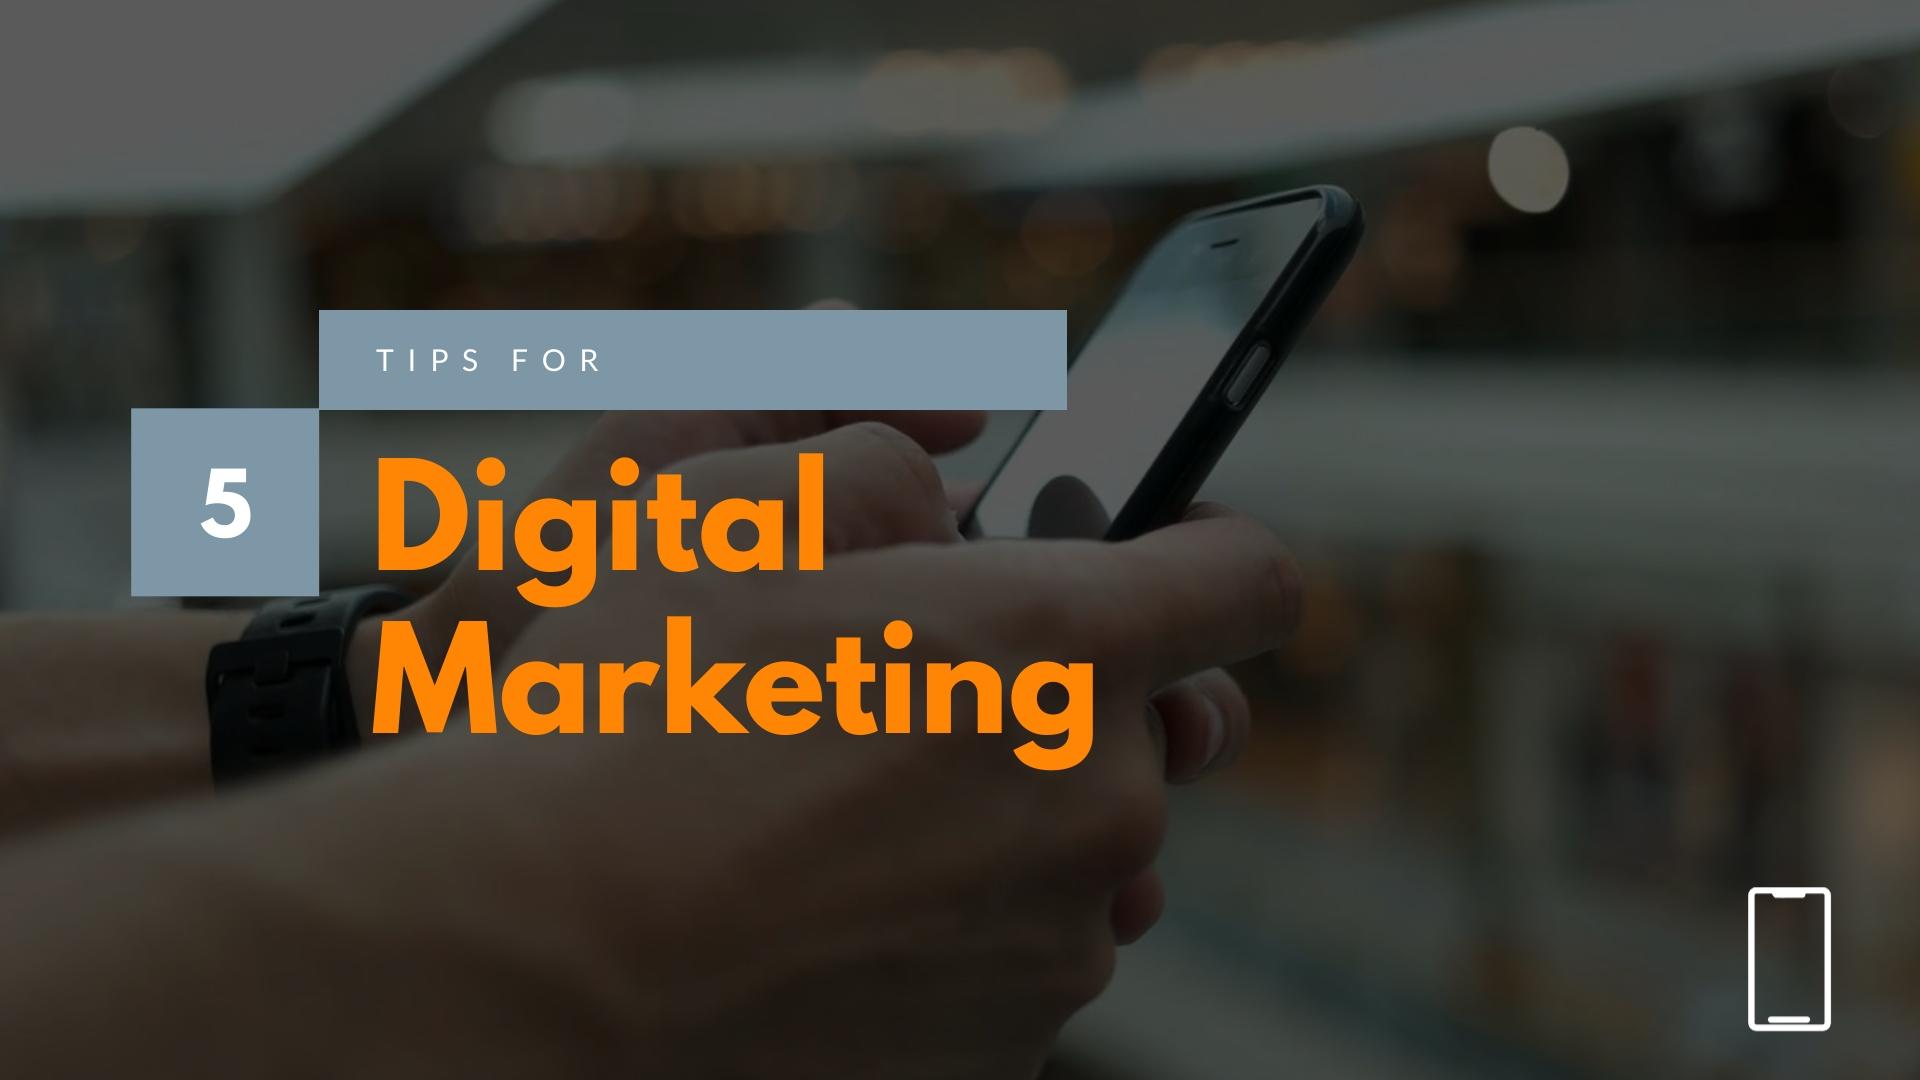 5 Tips for Digital Marketing - Explainer Video Template